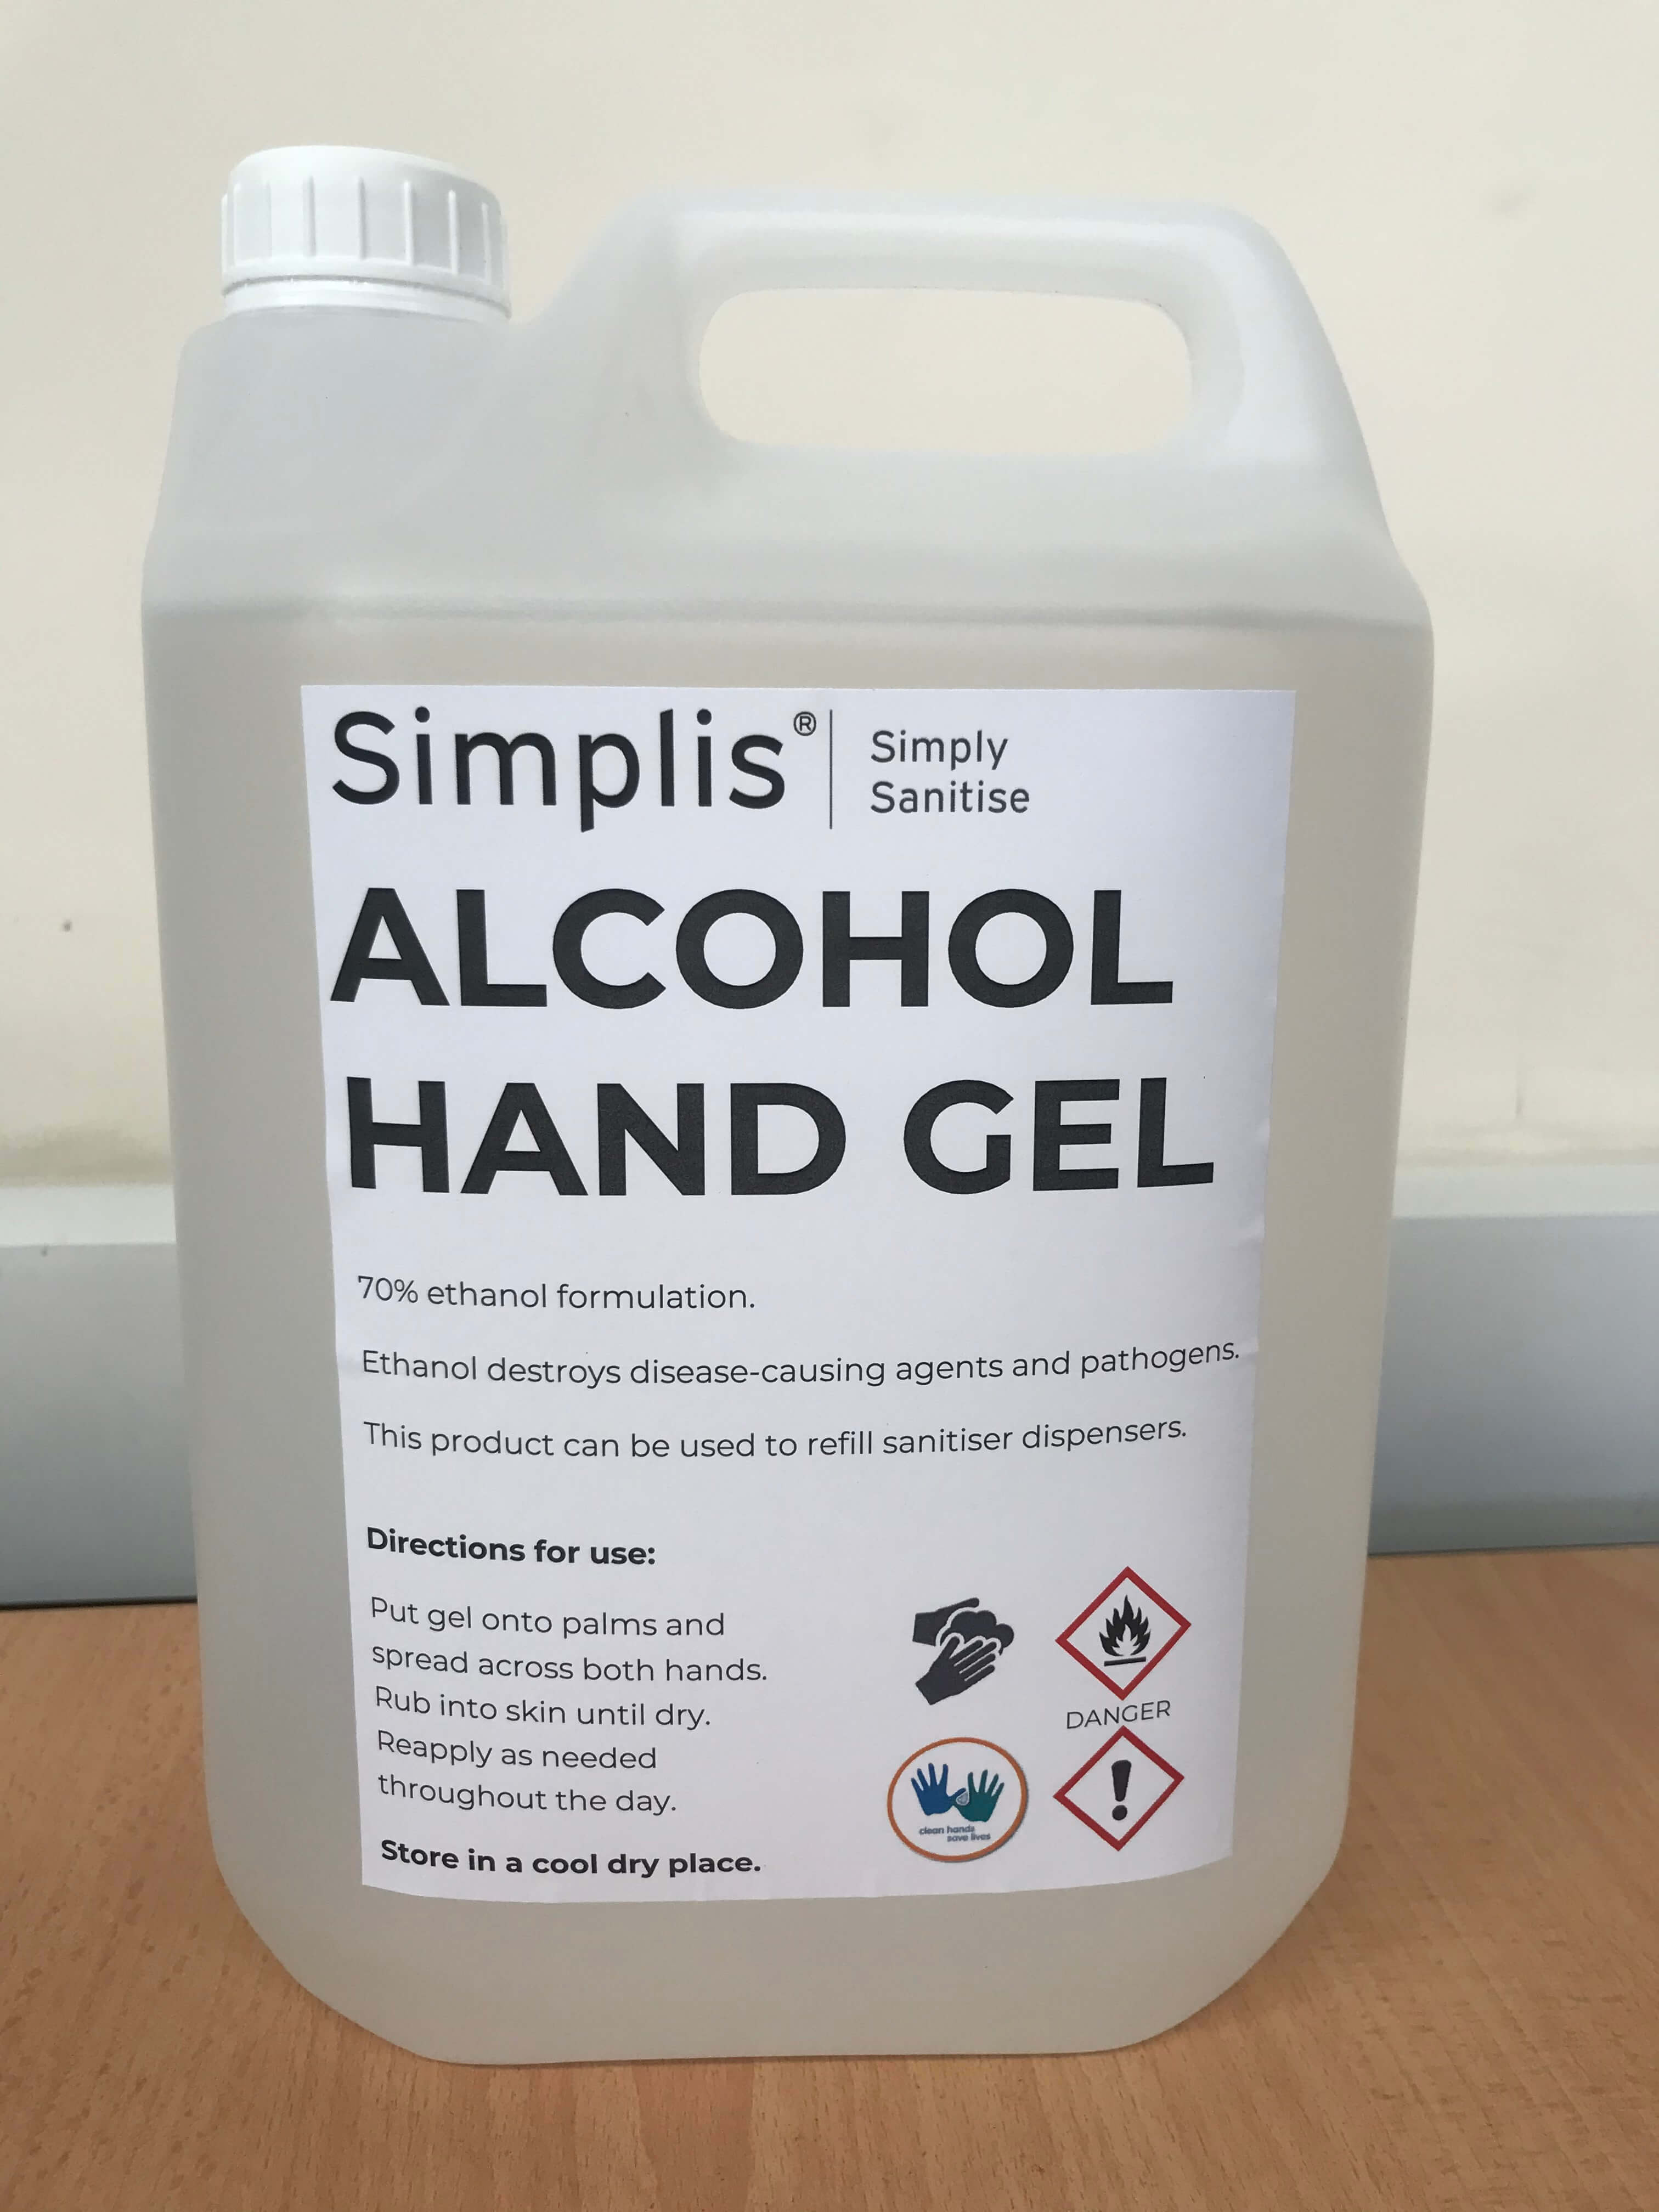 Simplis 70% Alcohol Hand Sanitiser Gel